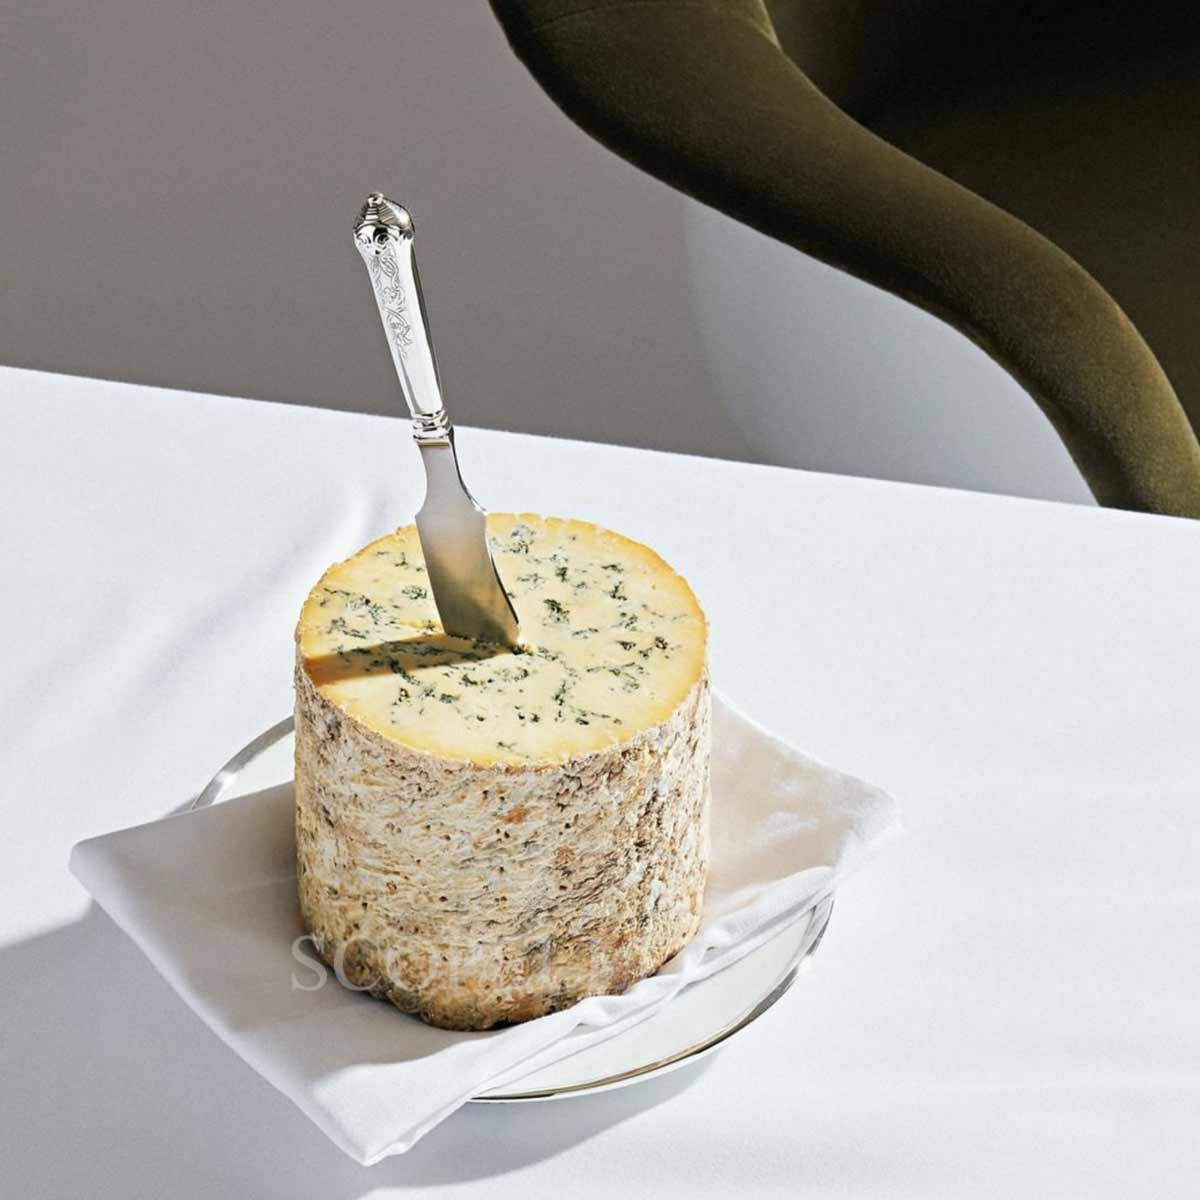 puiforcat elysee cheese knife